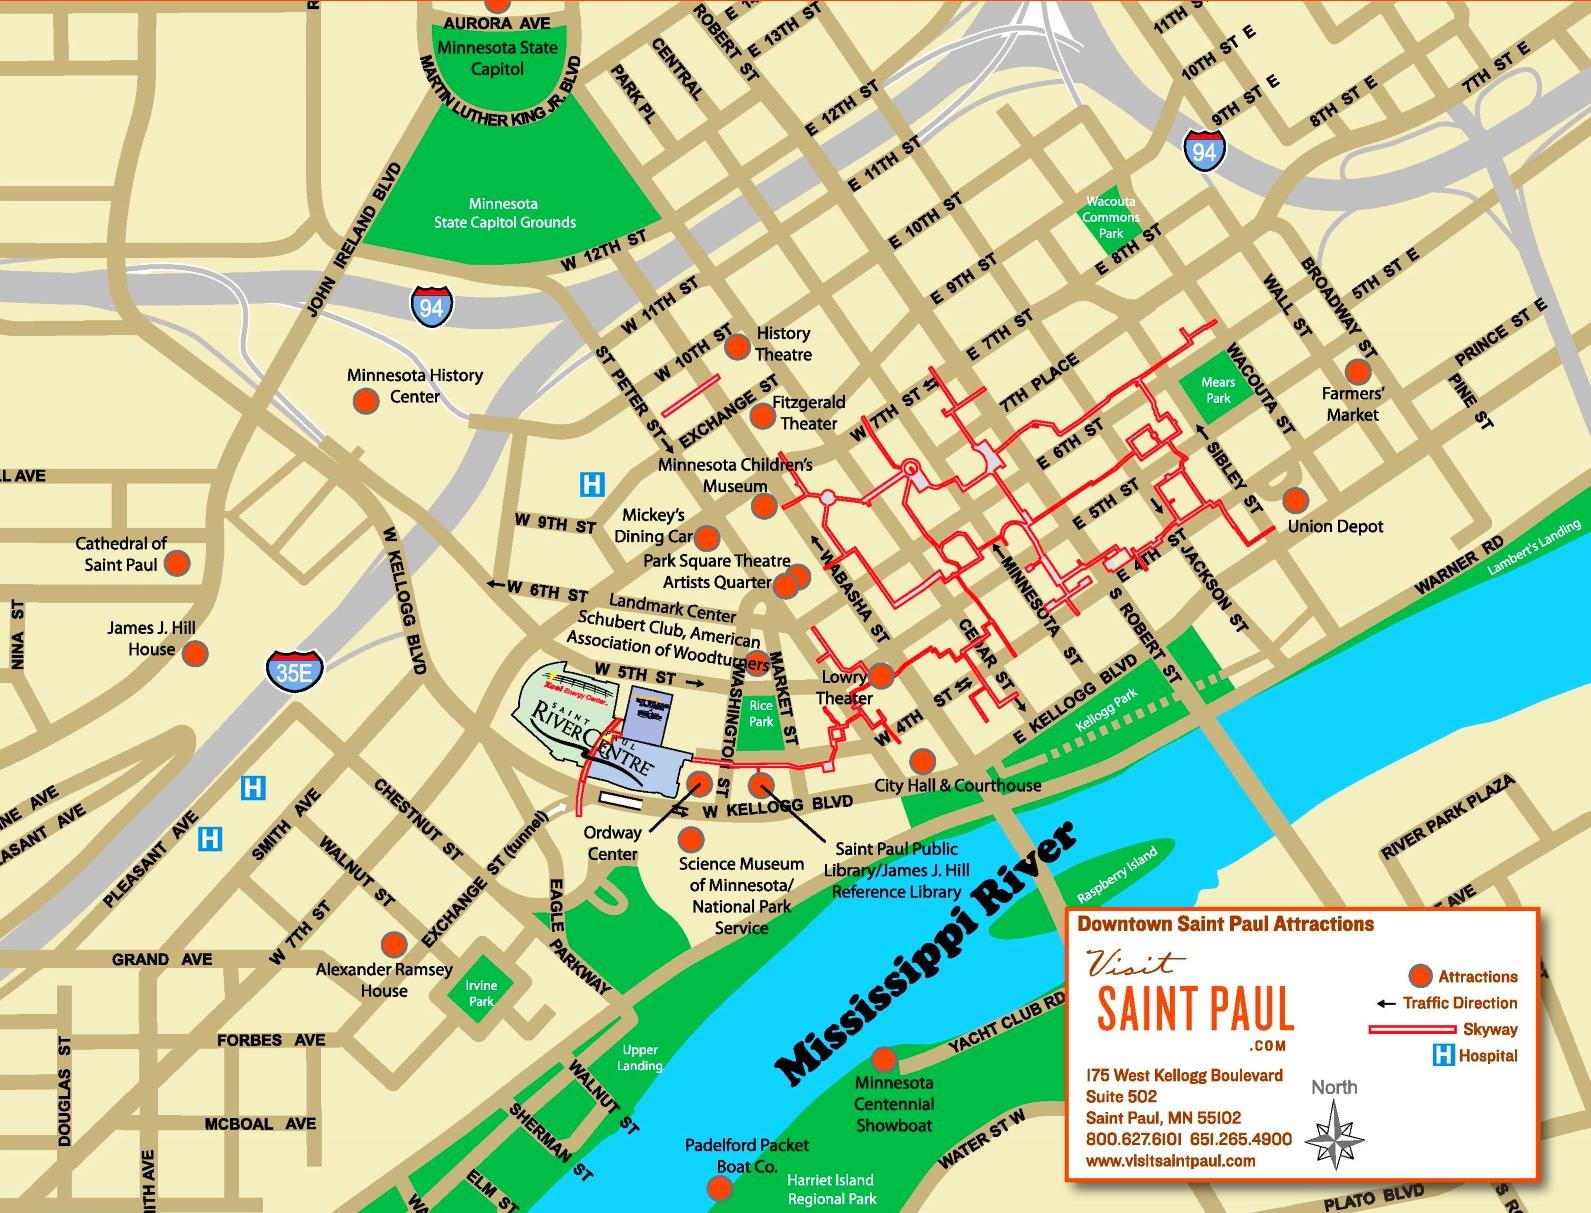 Saint Paul tourist attractions map